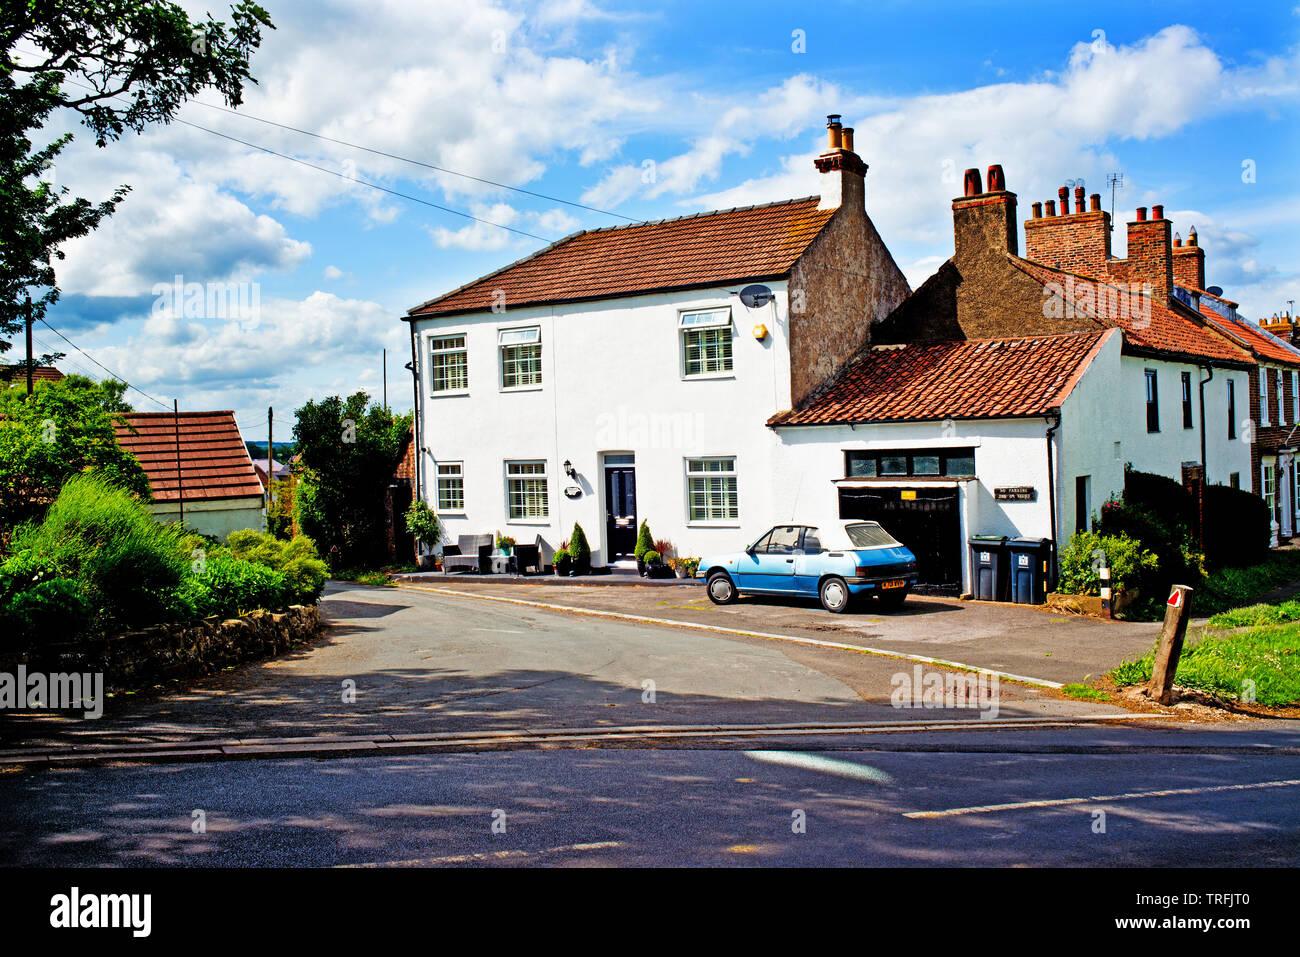 Period house and Peugeot 205 convertible car, Sadberge, Borough of Darlington, England Stock Photo